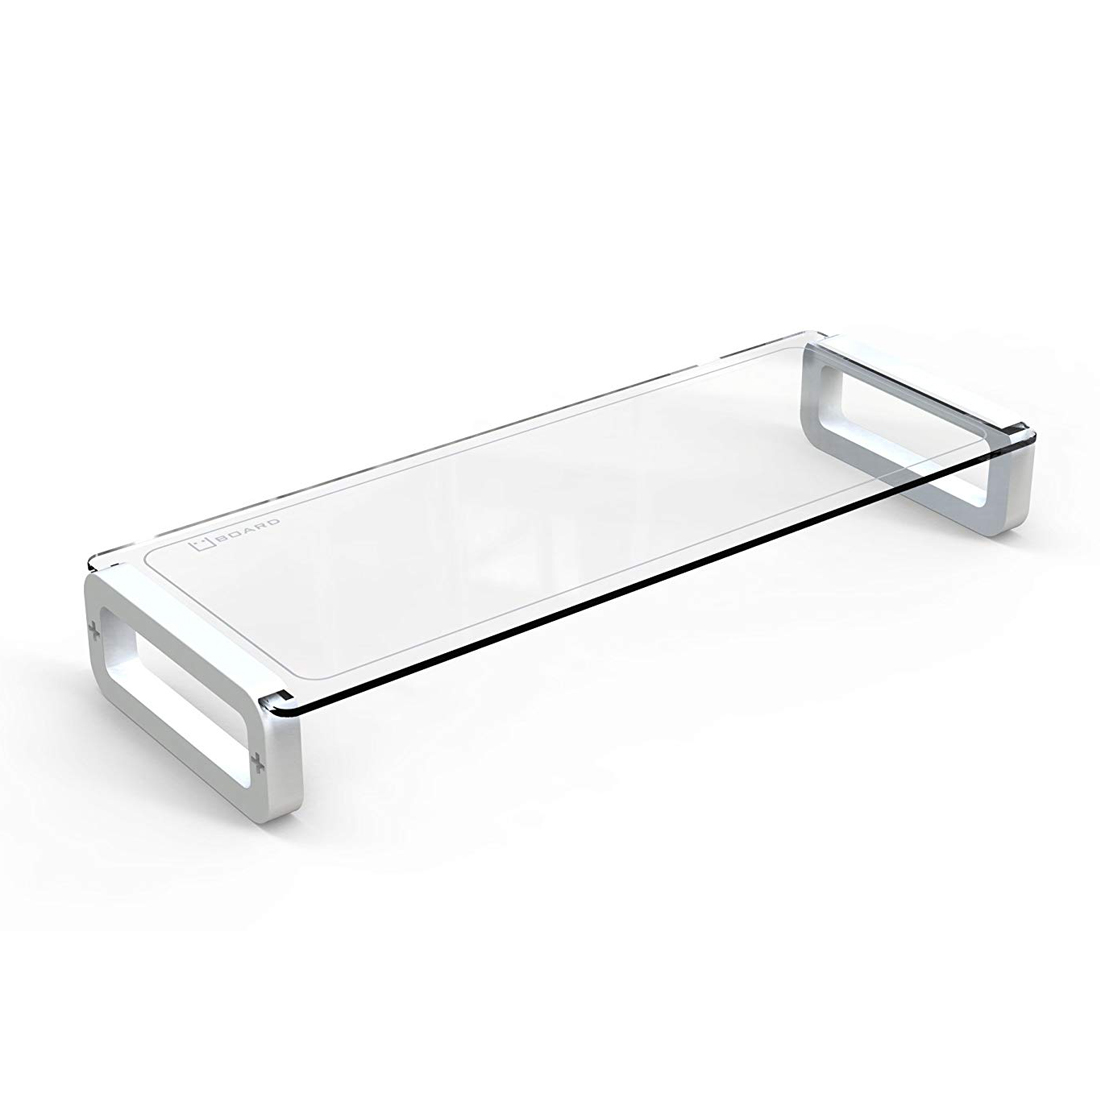 Uboard Basic Tempered Glass Monitor Stand Shelf Multiboard